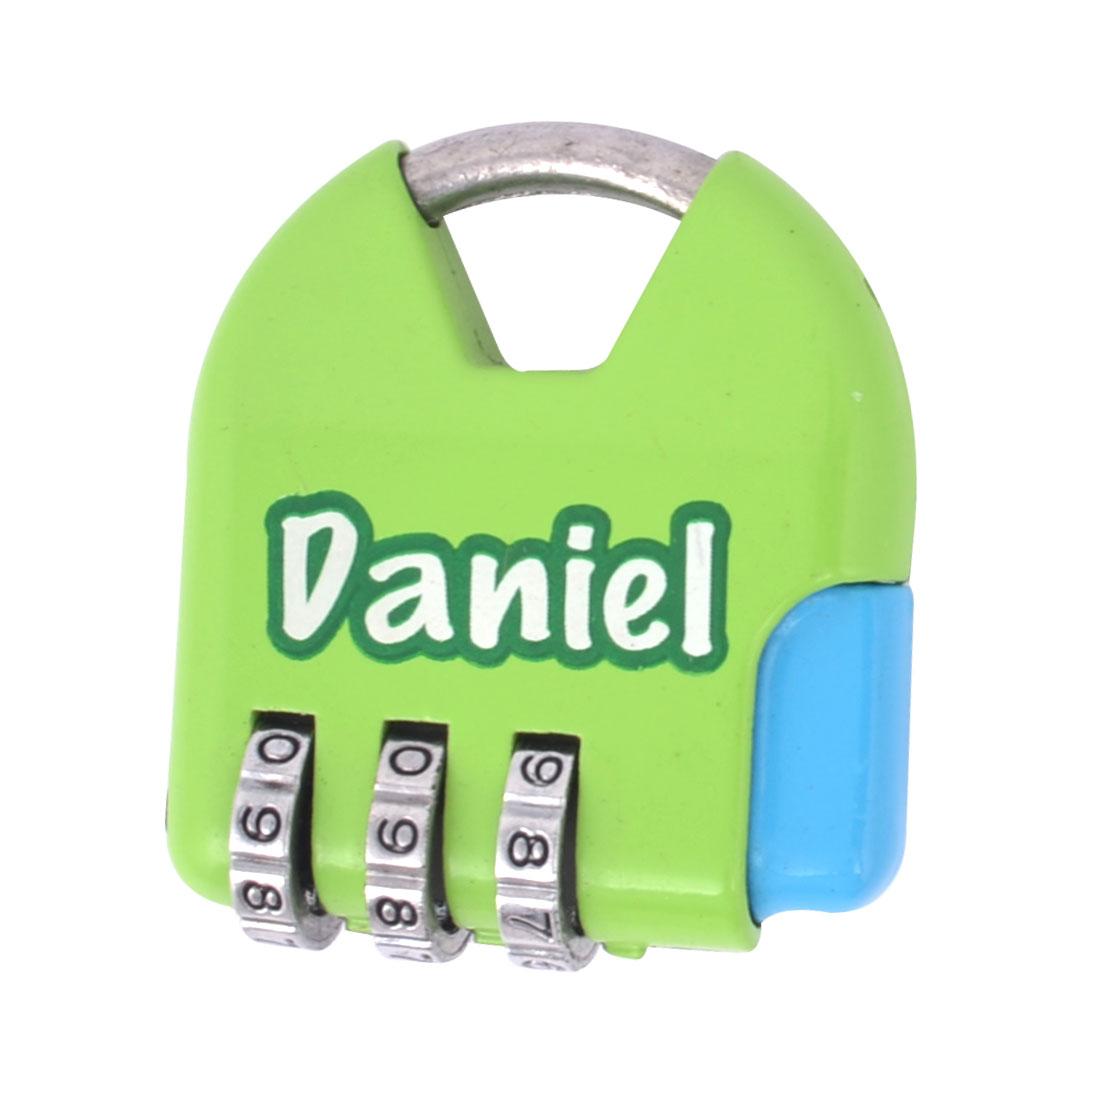 Green Handbag Shaped Jewelry Box Drawer Combination Password Padlock